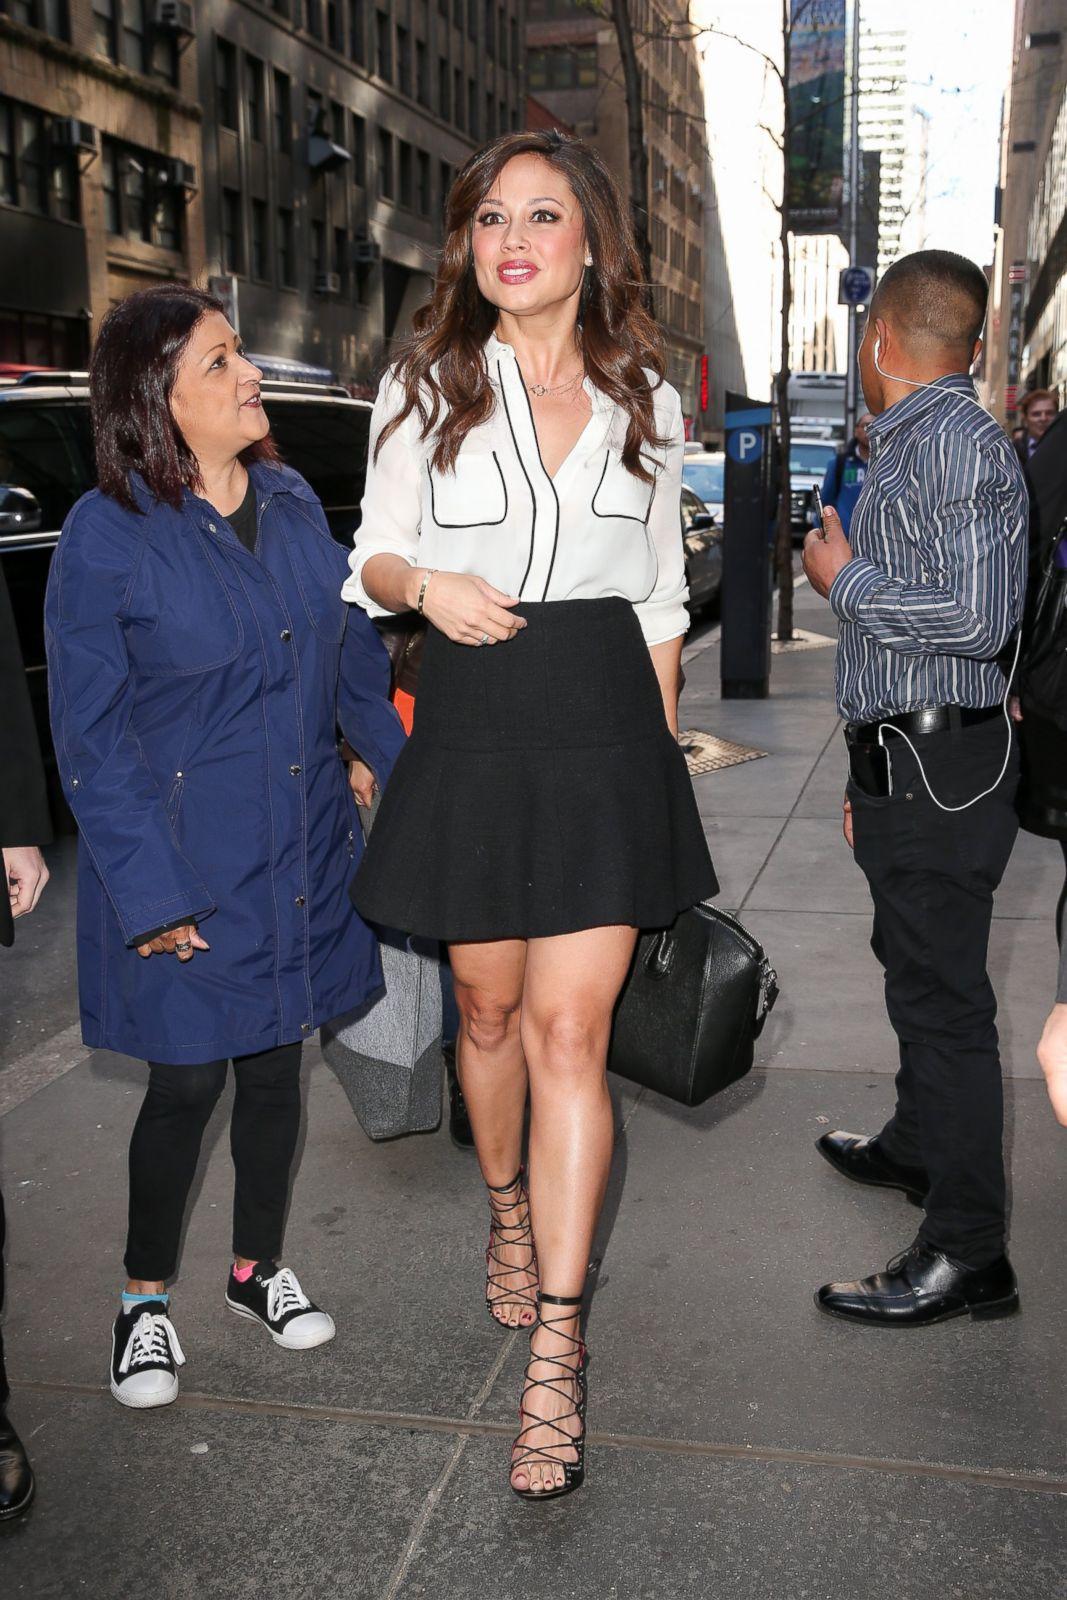 Maria big booty latina cam